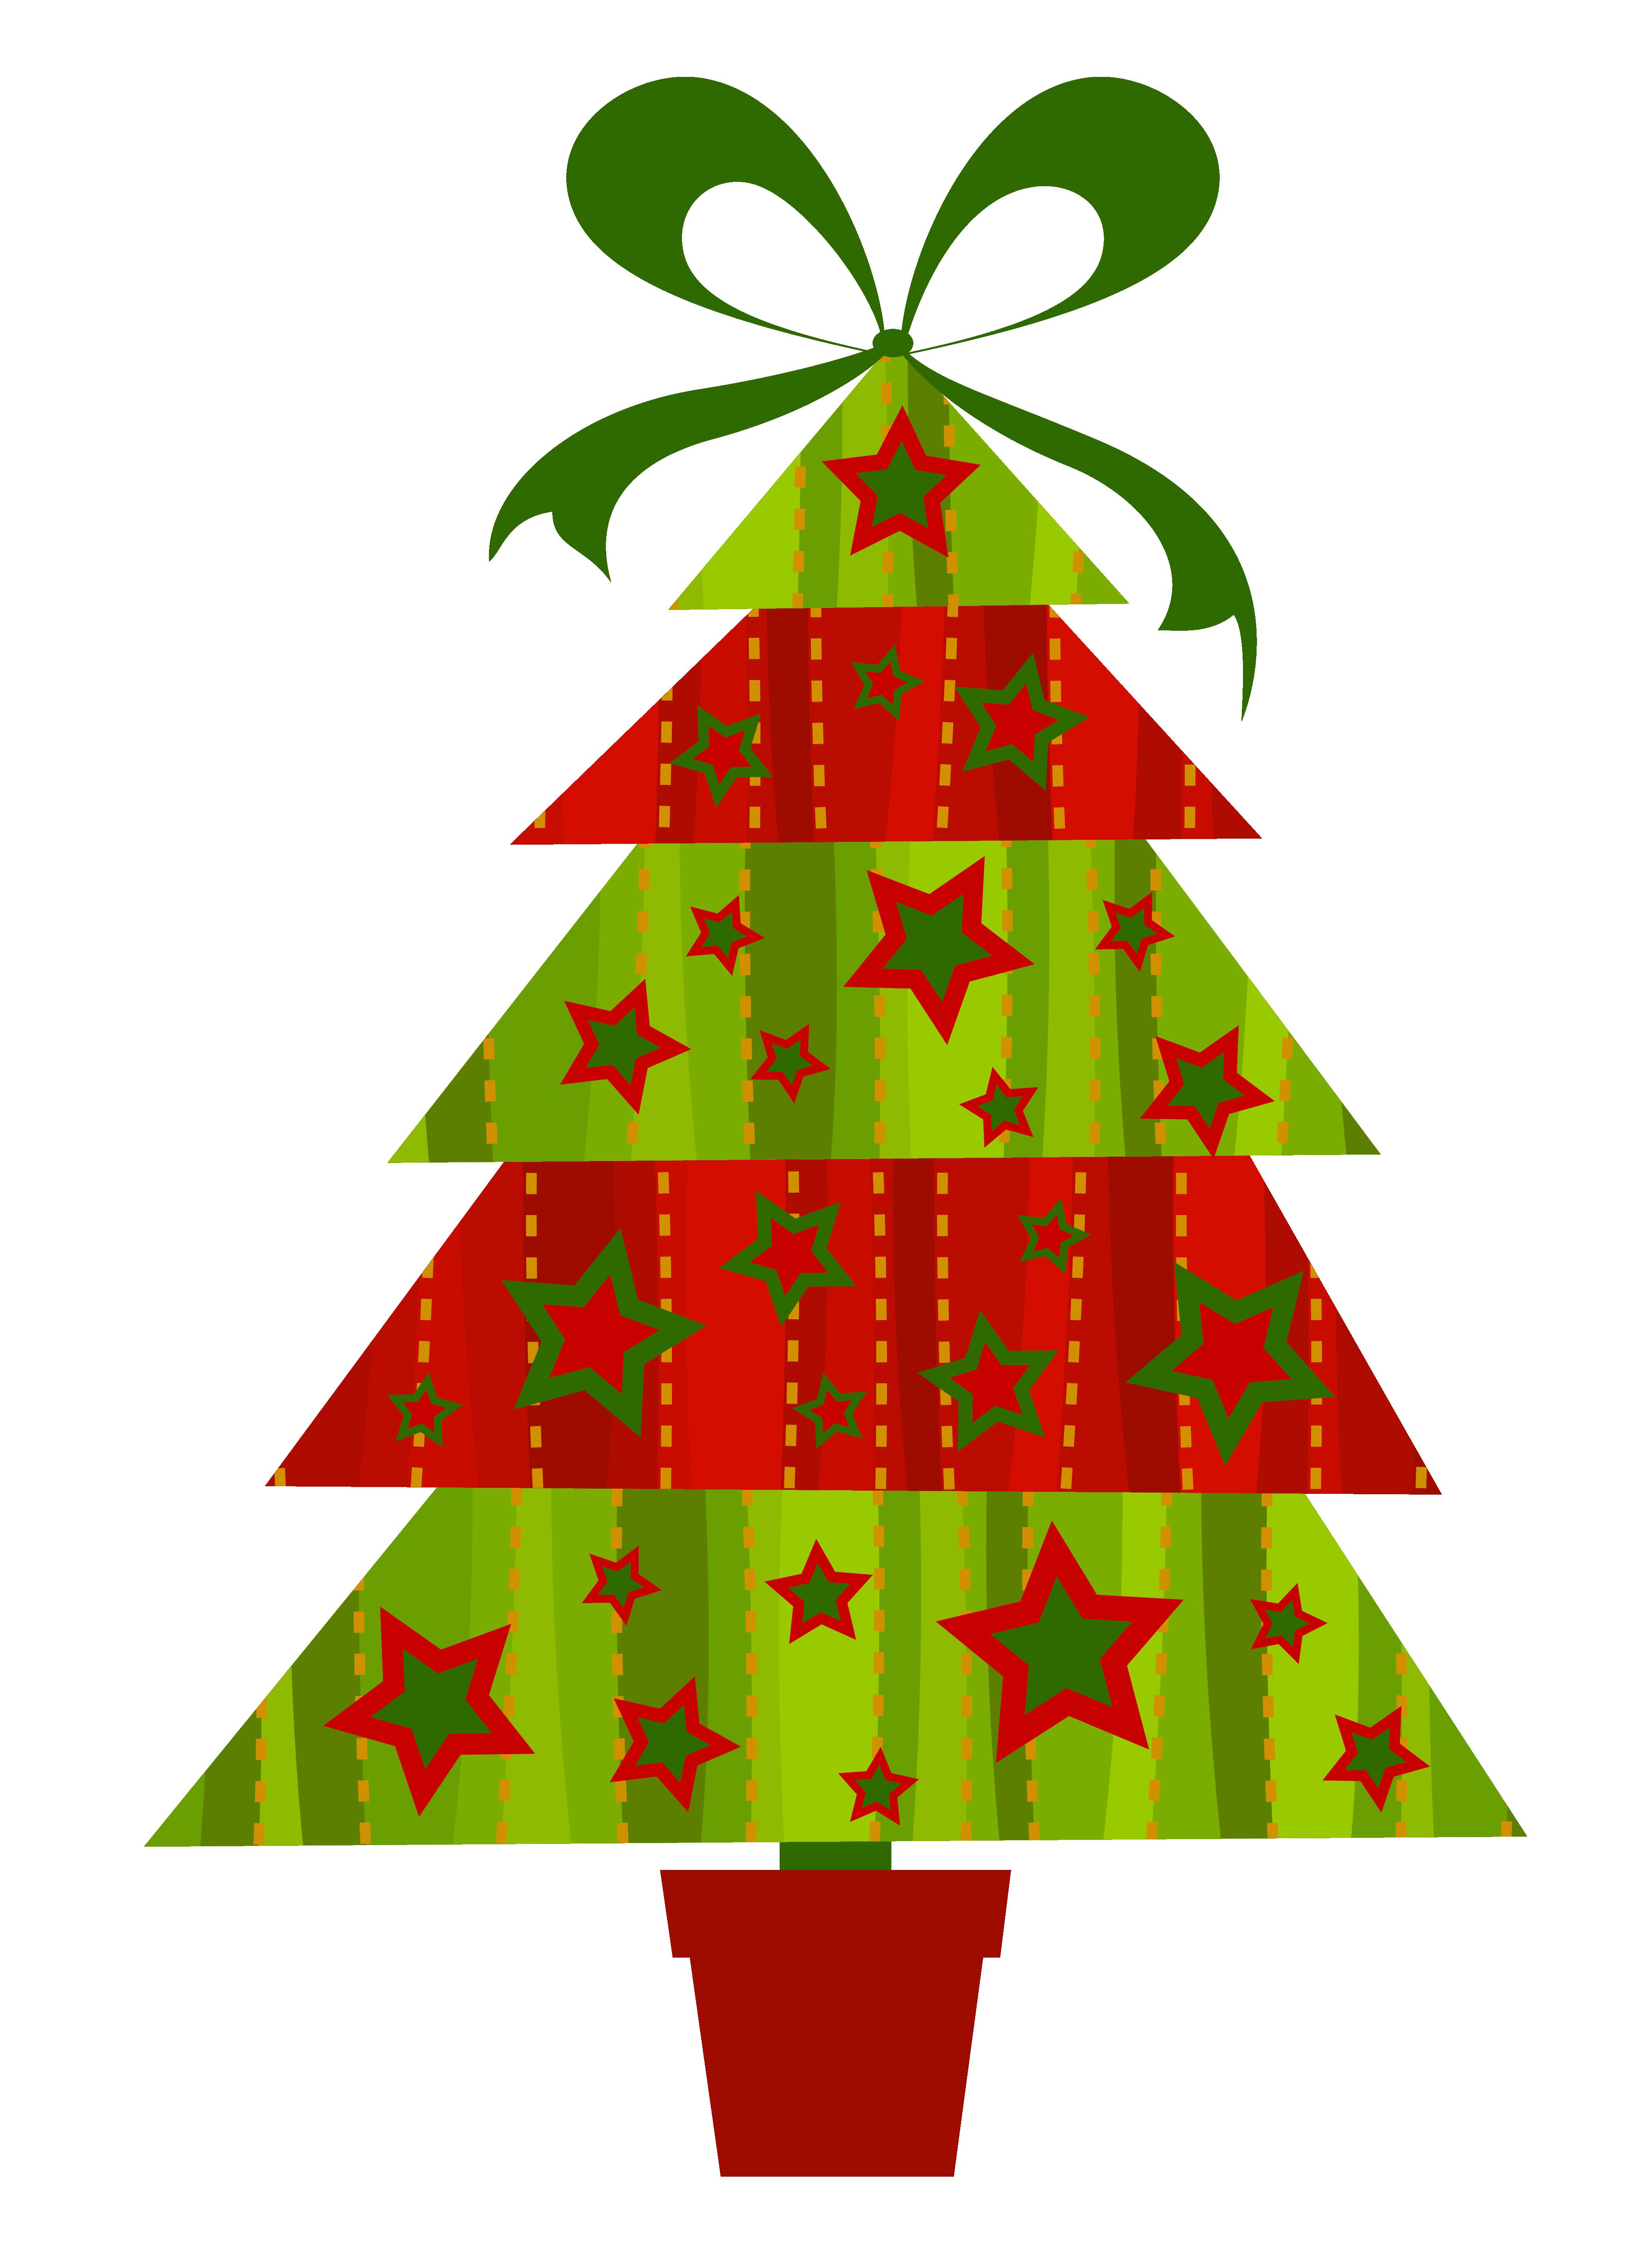 Free modern christmas clipart image freeuse stock Free Christmas Tree Clip Art, Download Free Clip Art, Free Clip Art ... image freeuse stock